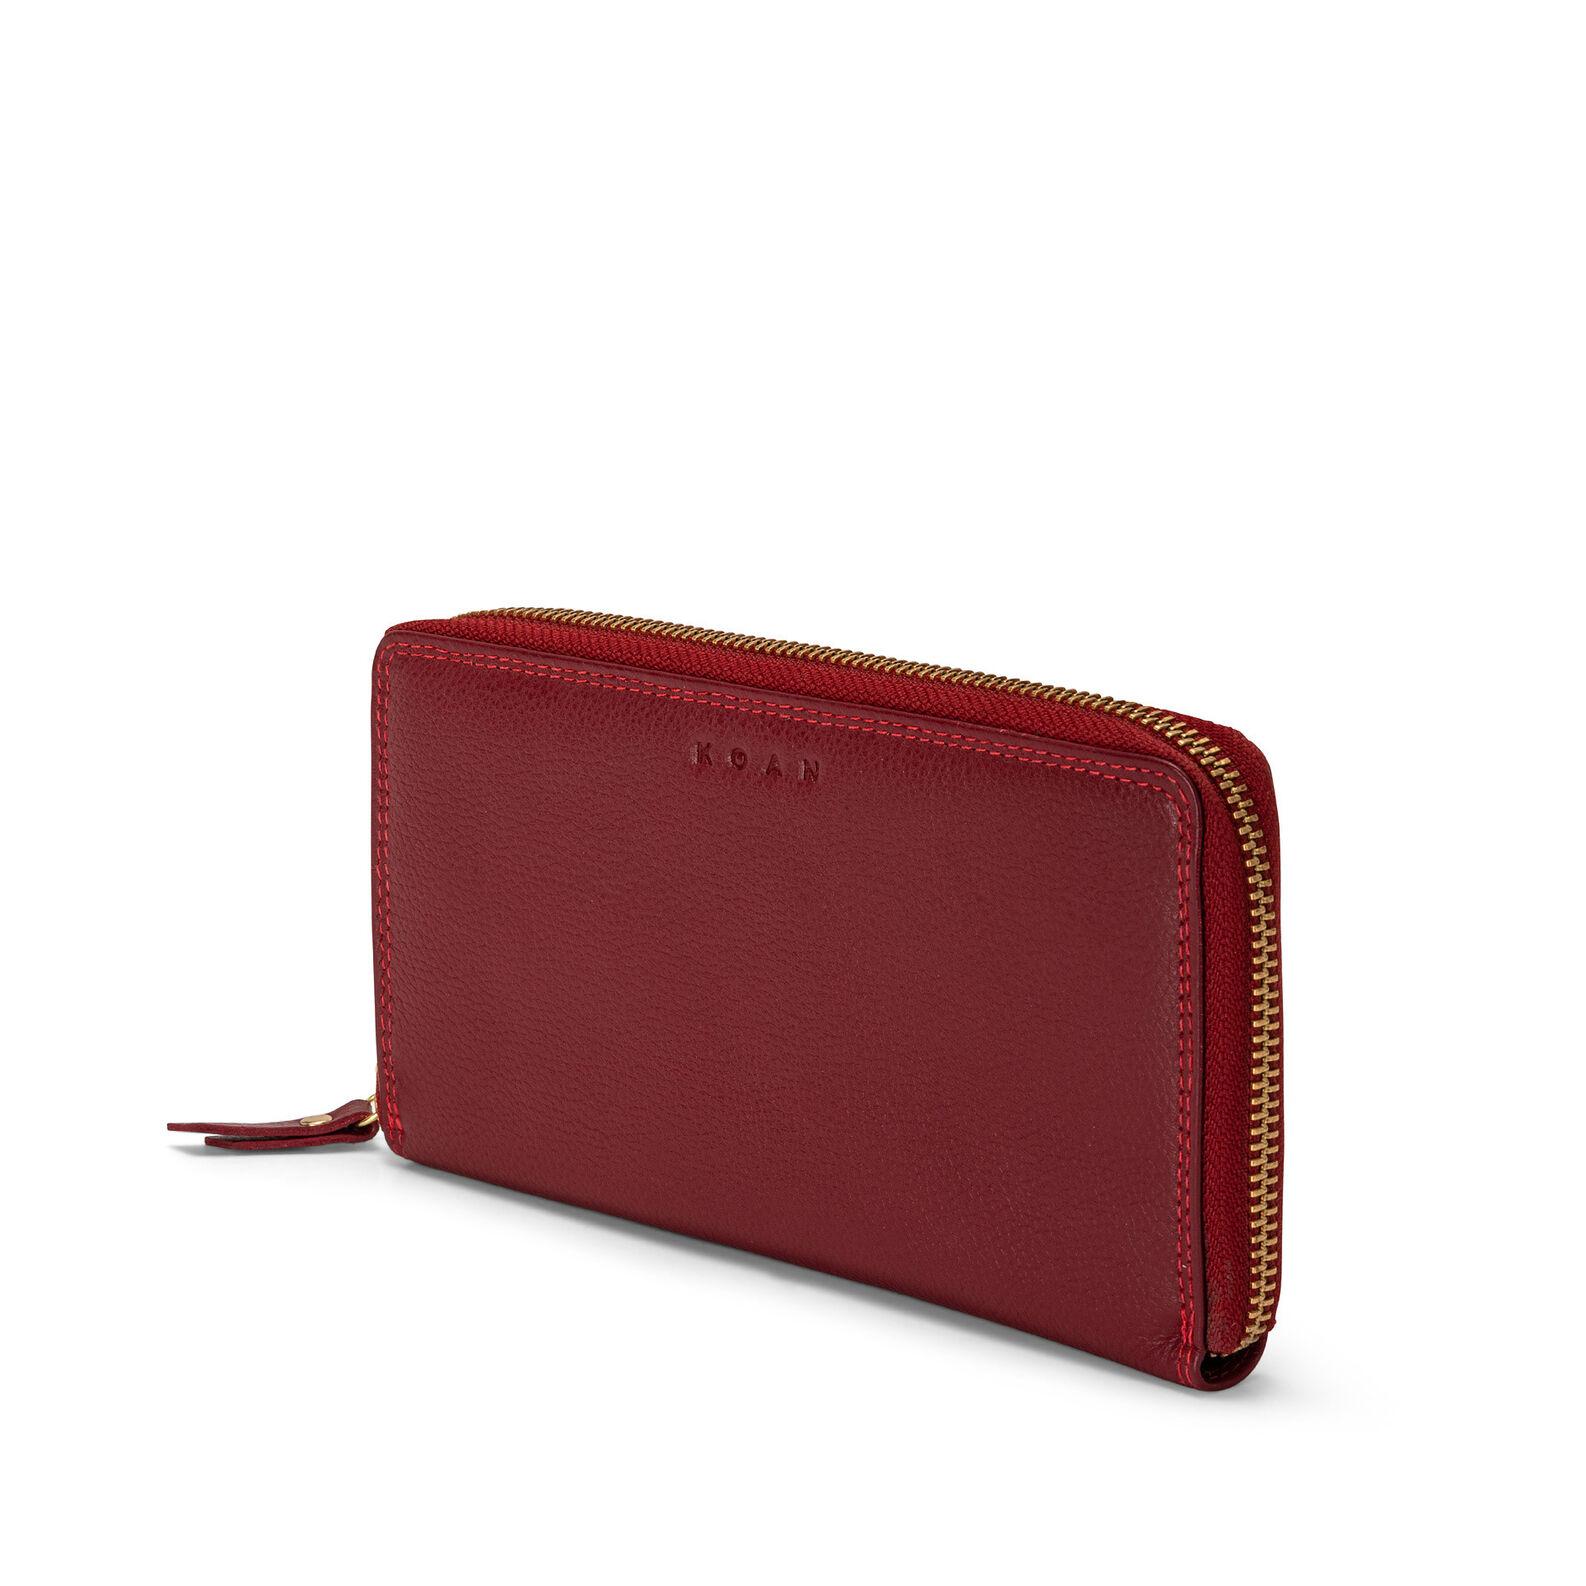 Koan wallet with zip in genuine leather